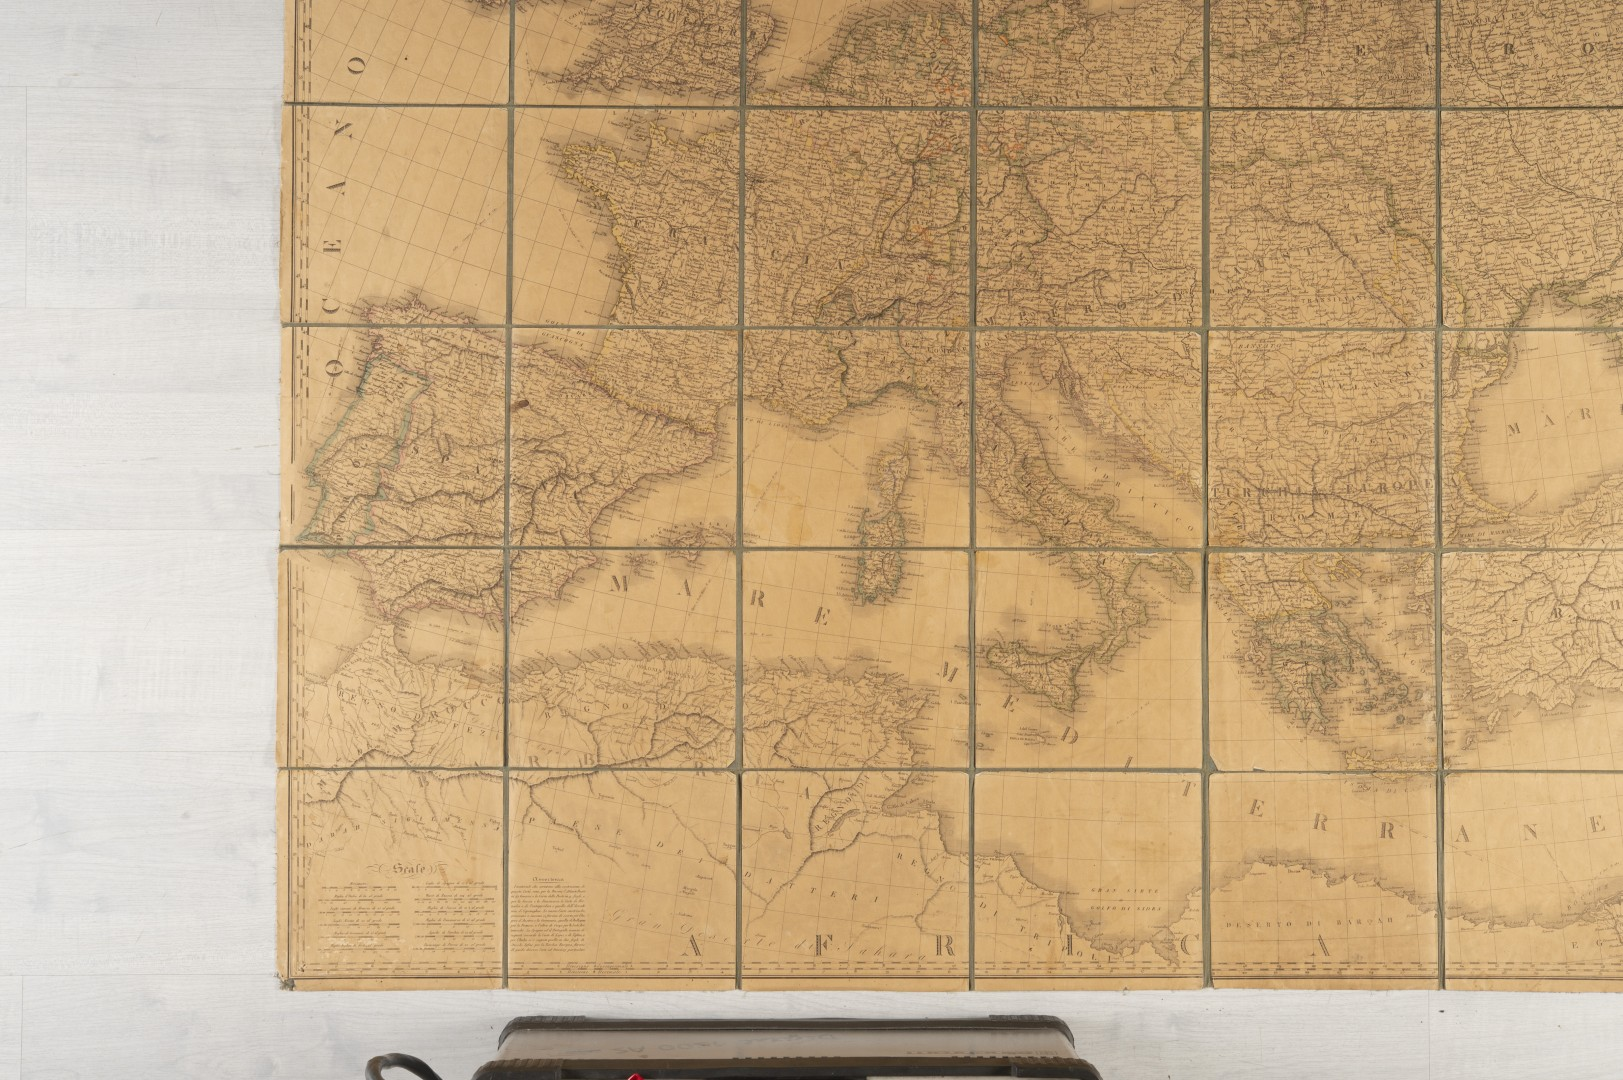 Stucchi, Stanislao Carta geografica statistica e stradale d'Europa. - Image 8 of 8